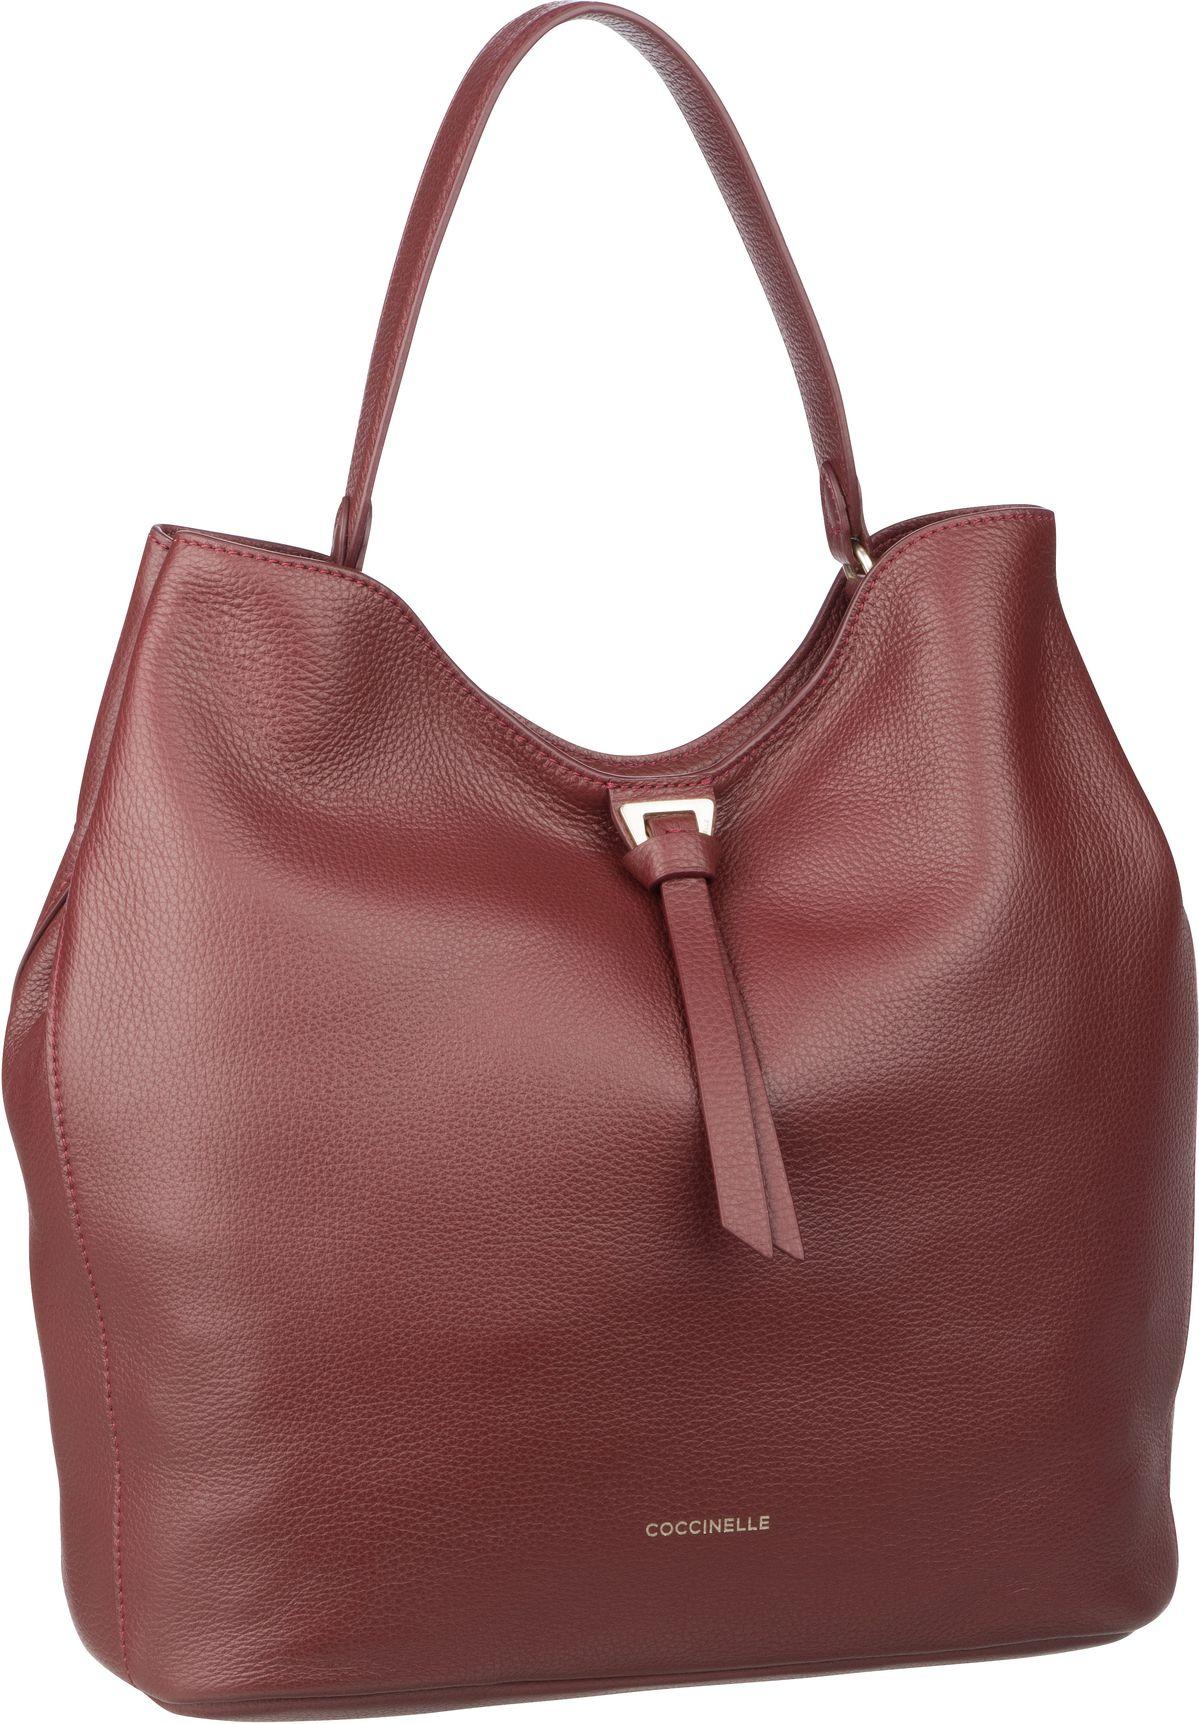 Handtasche Joyful 1301 Marsala